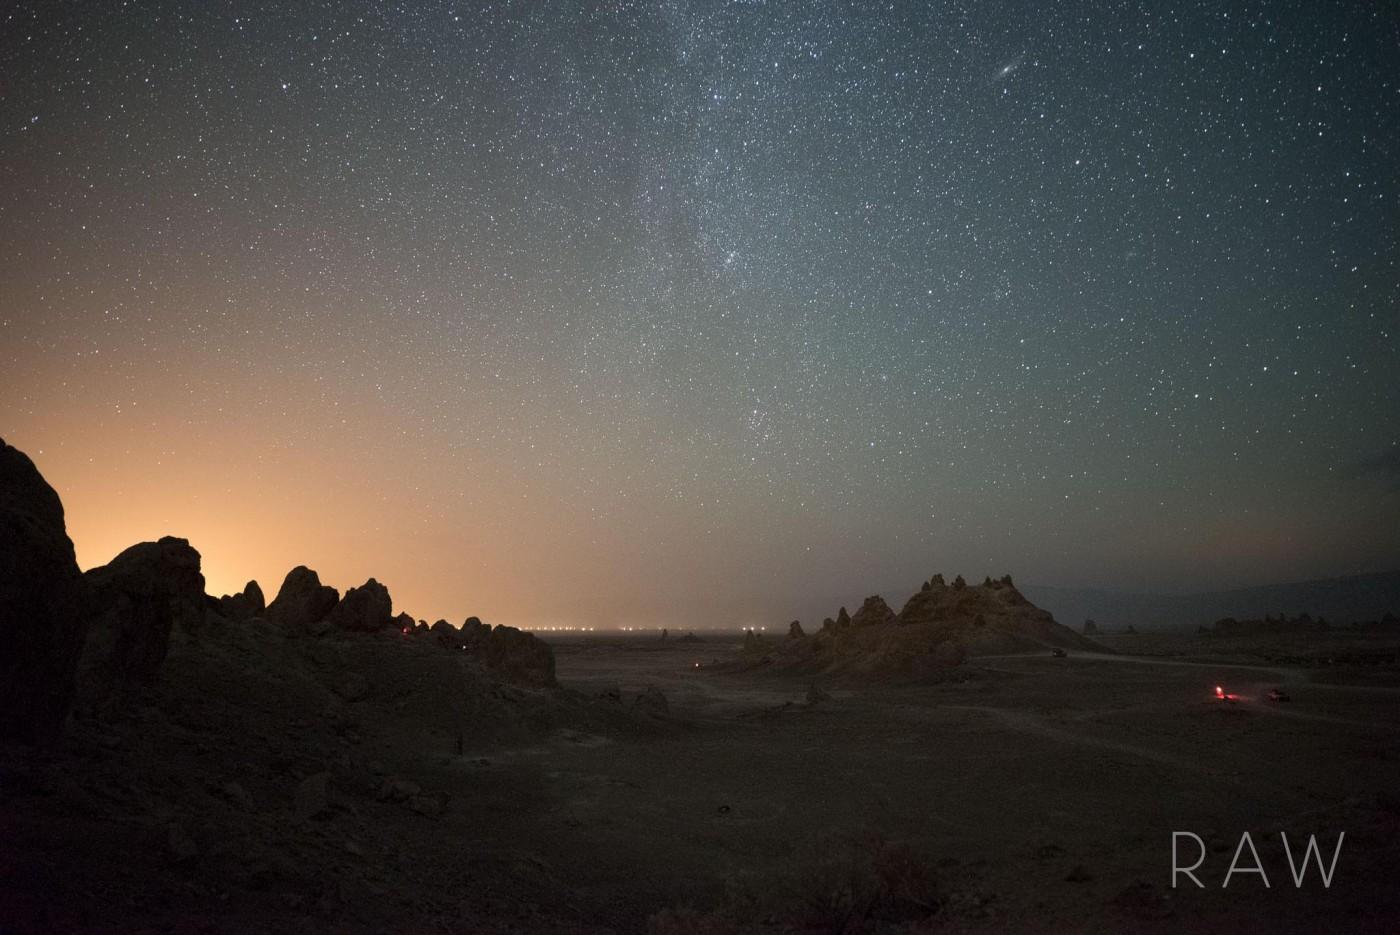 navajo-milky-way-astrophotography-lonely-speck-lightroom-preset-1